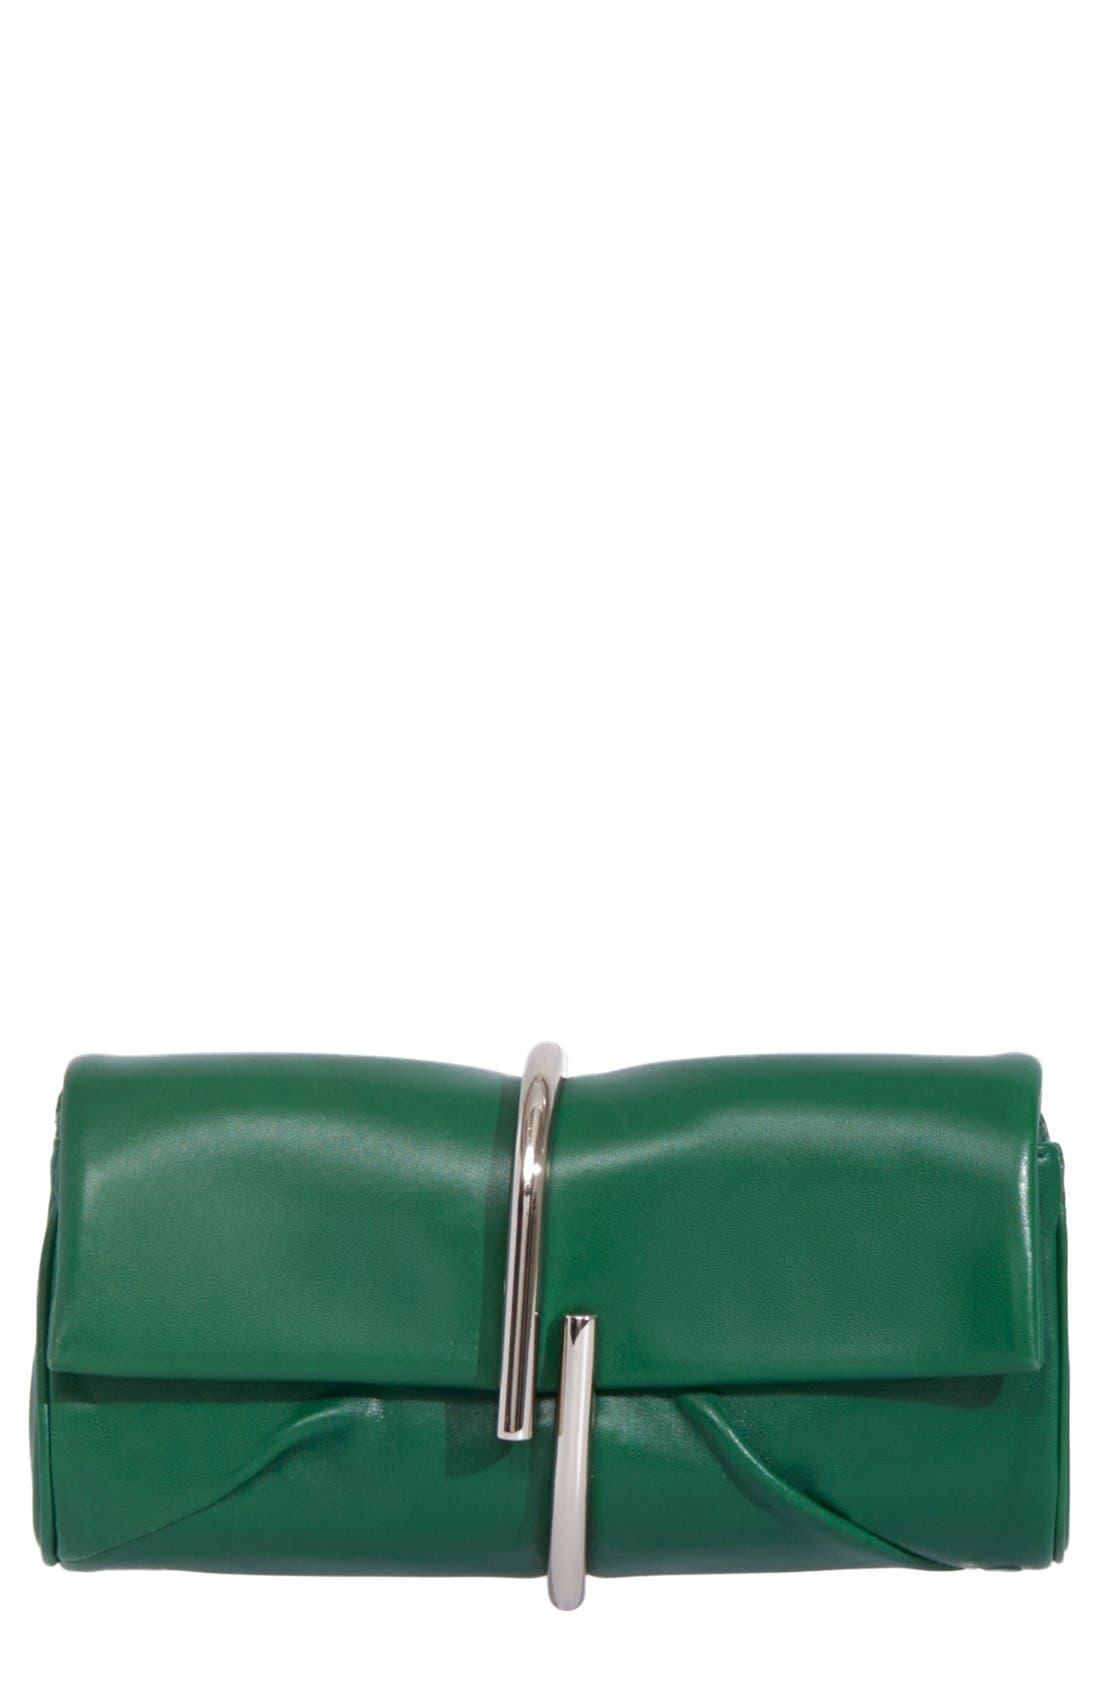 3.1 PHILLIP LIM 'Alix' Leather Minaudiere, Main, color, 300